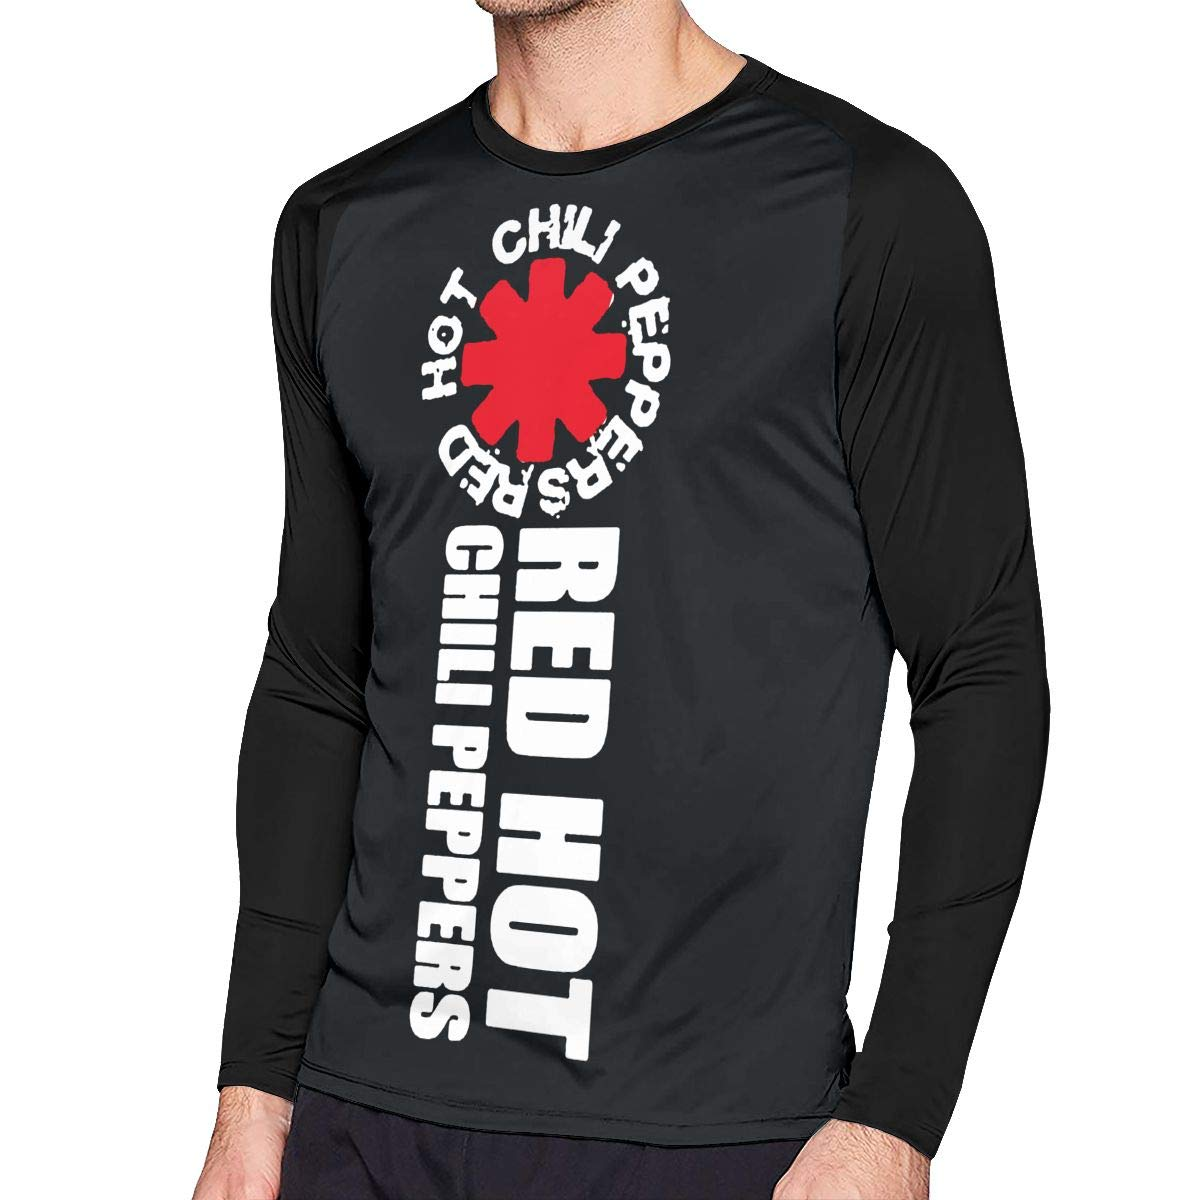 95ac0fd8b6d5 Kooiico Mens Fashion Red Hot Chili Peppers Rock Band Logo Long Sleeve Raglan  Baseball Tshirts Black